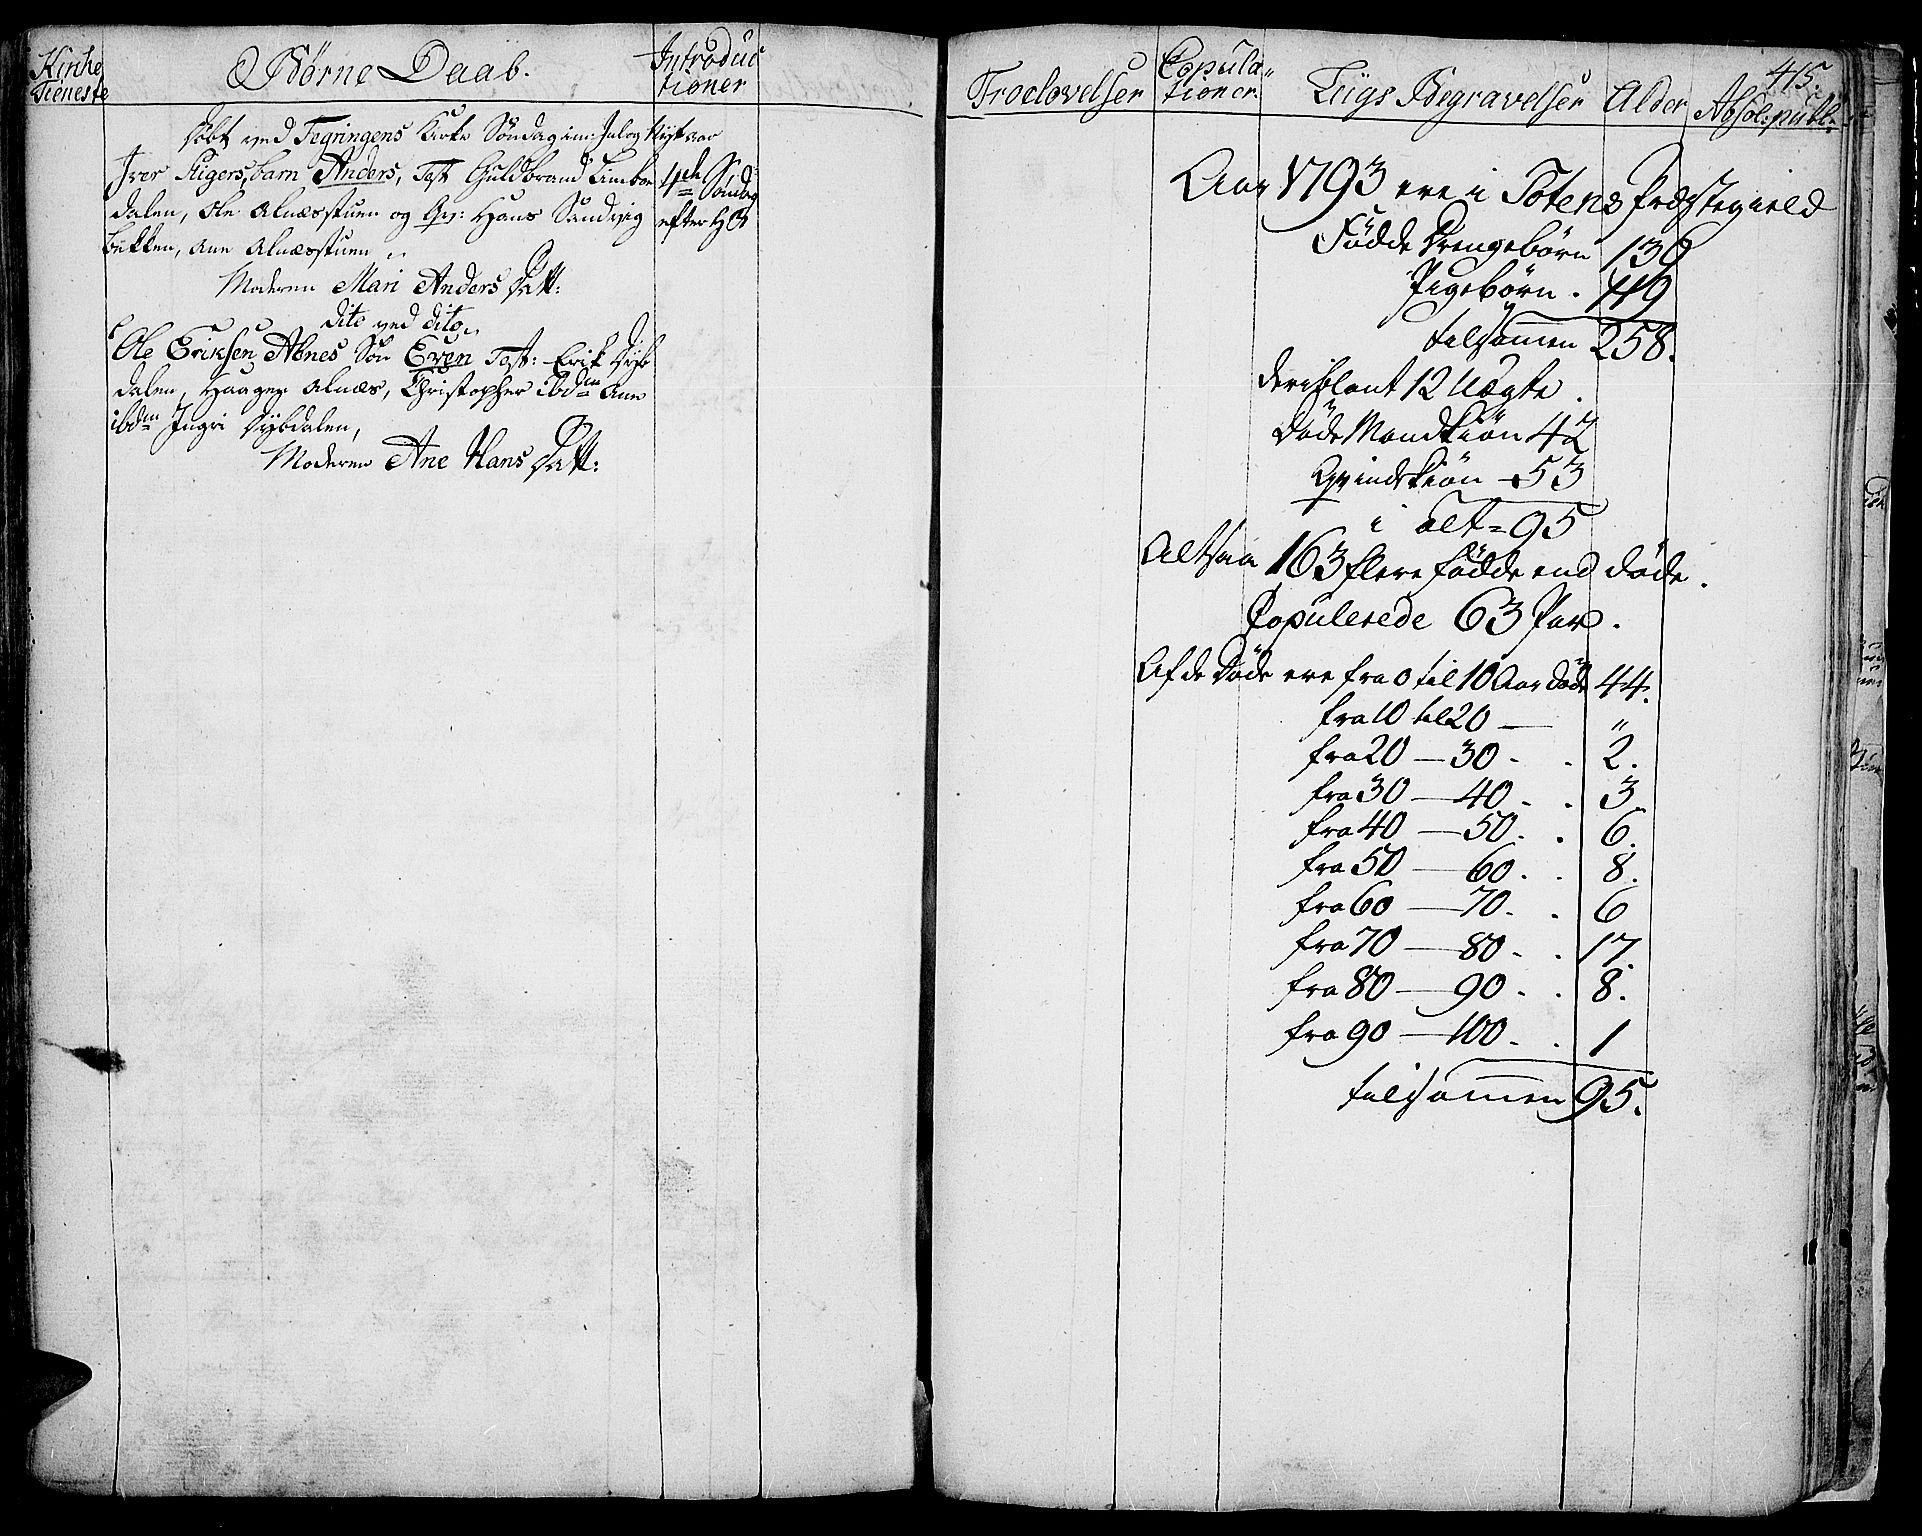 SAH, Toten prestekontor, Ministerialbok nr. 6, 1773-1793, s. 415